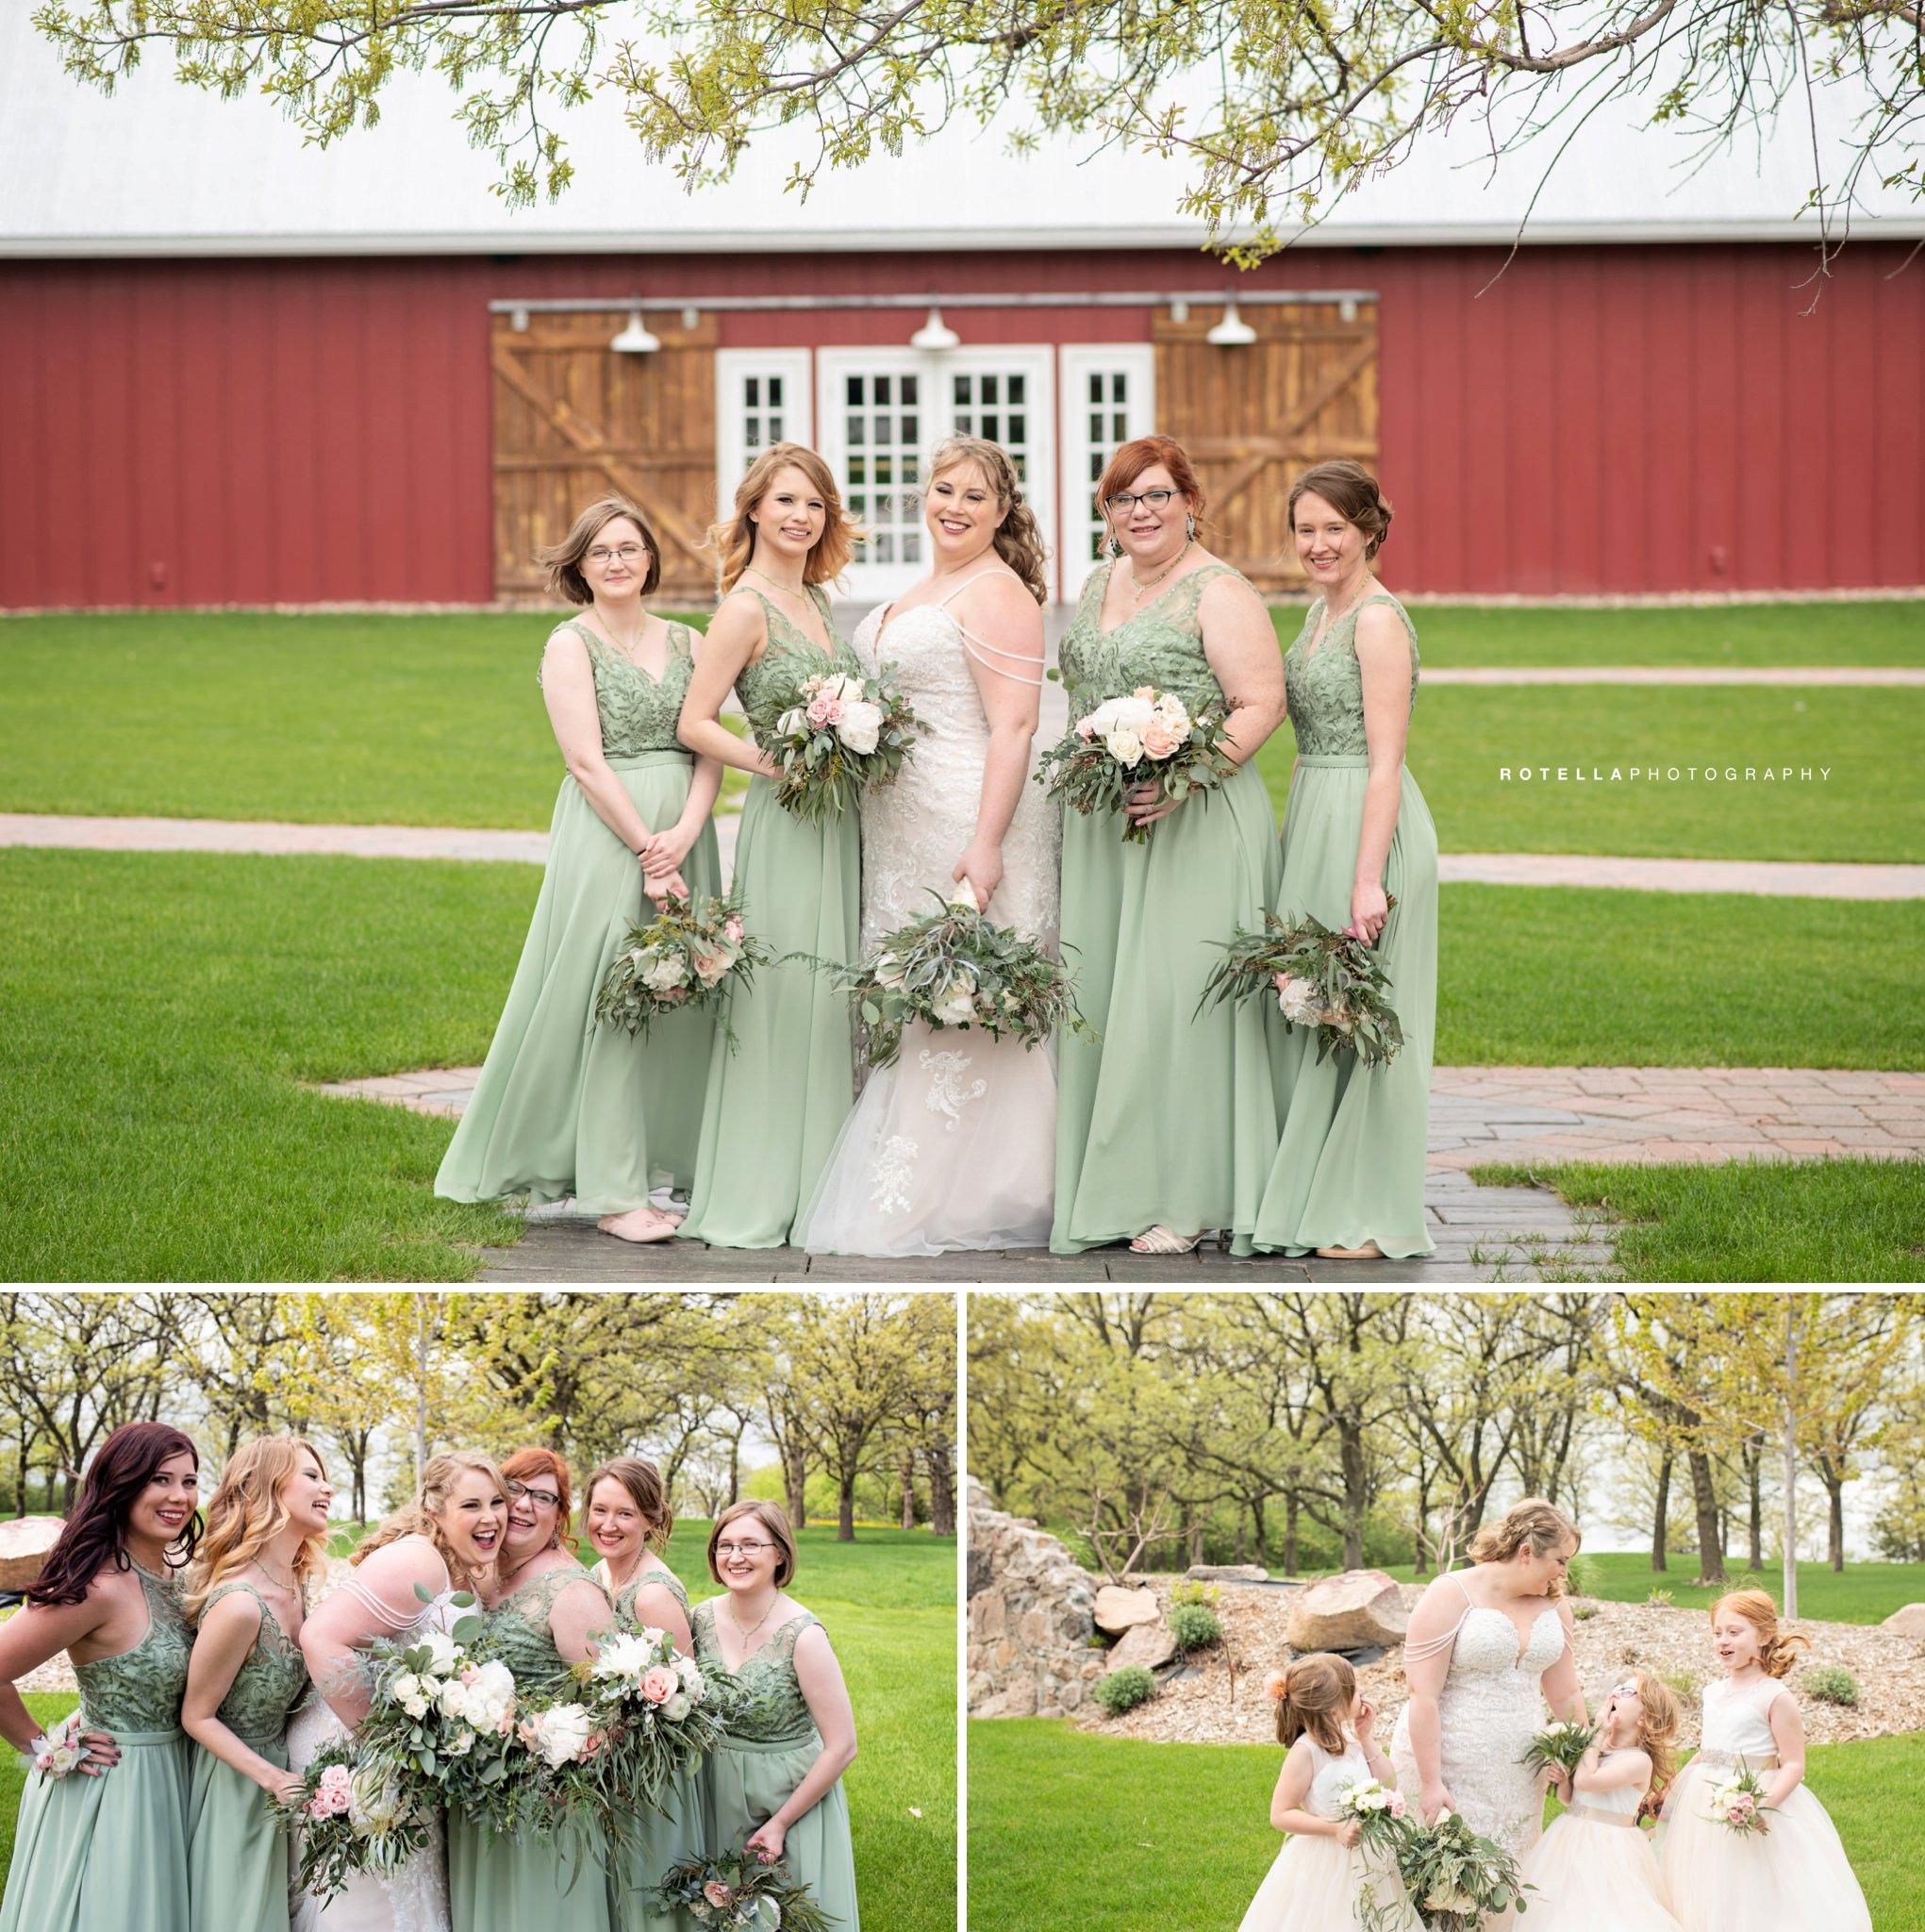 Cassie-Corbin-Wedding-05-25-2019-Rotella-Photography-PREV-97-329_BLOG.jpg